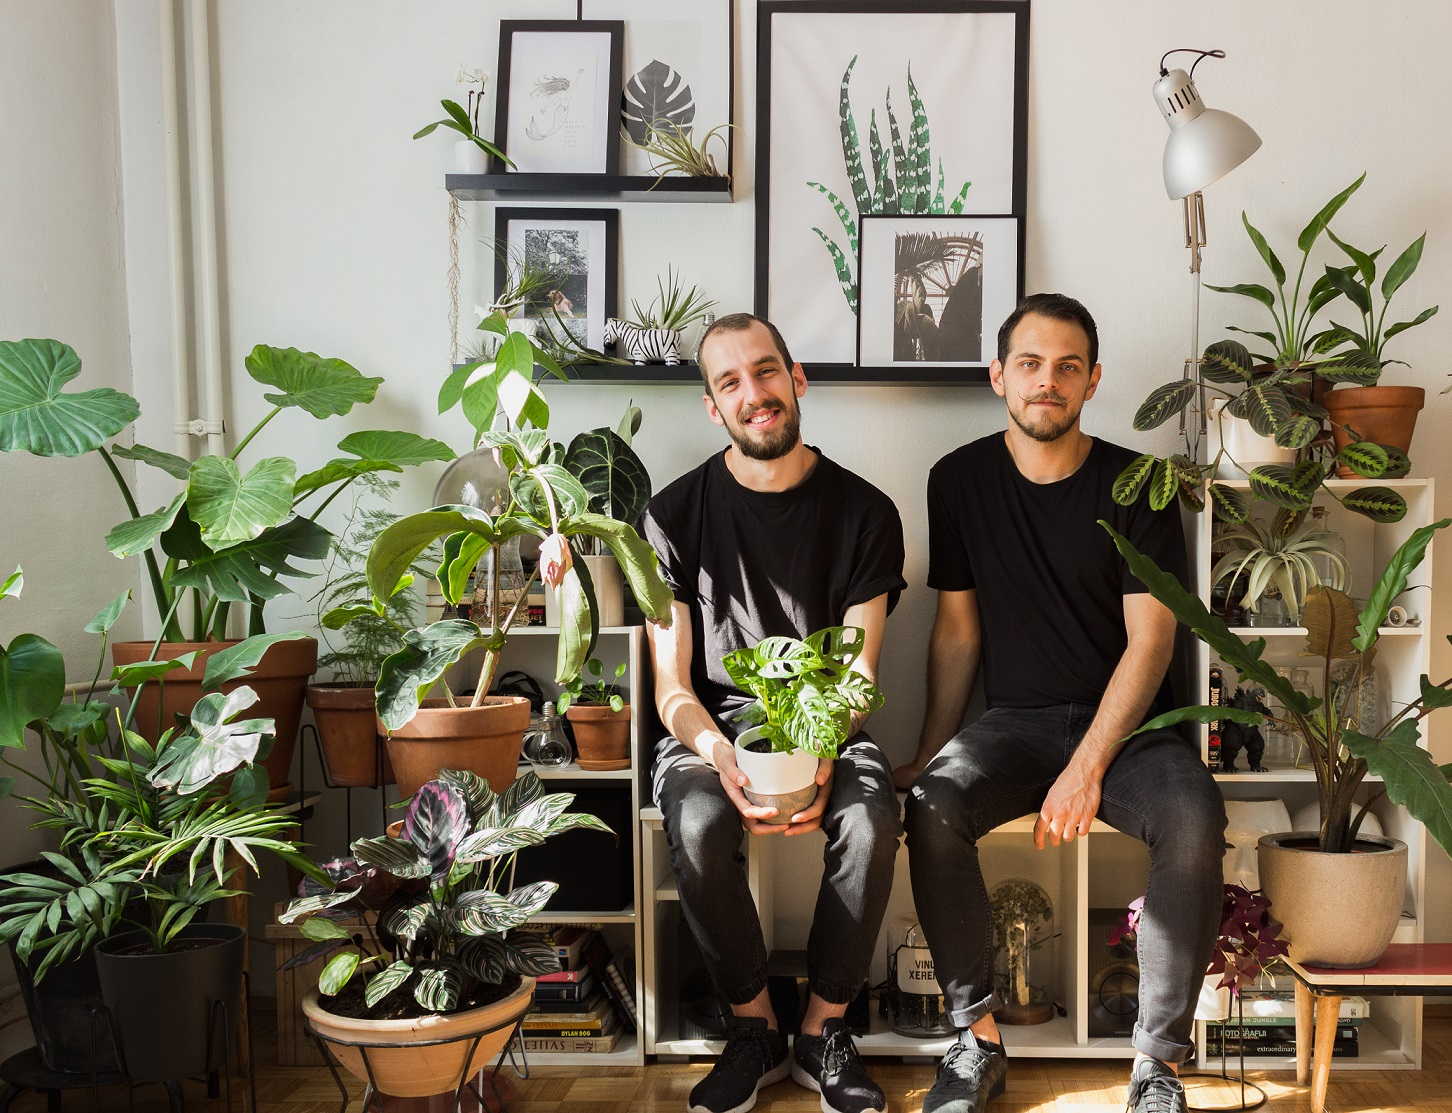 Dnevna doza biljaka projekt je nastao iz ljubavi prema biljkama, a iza njega stoje osnivači Leon i Tomislav iz Zagreba.